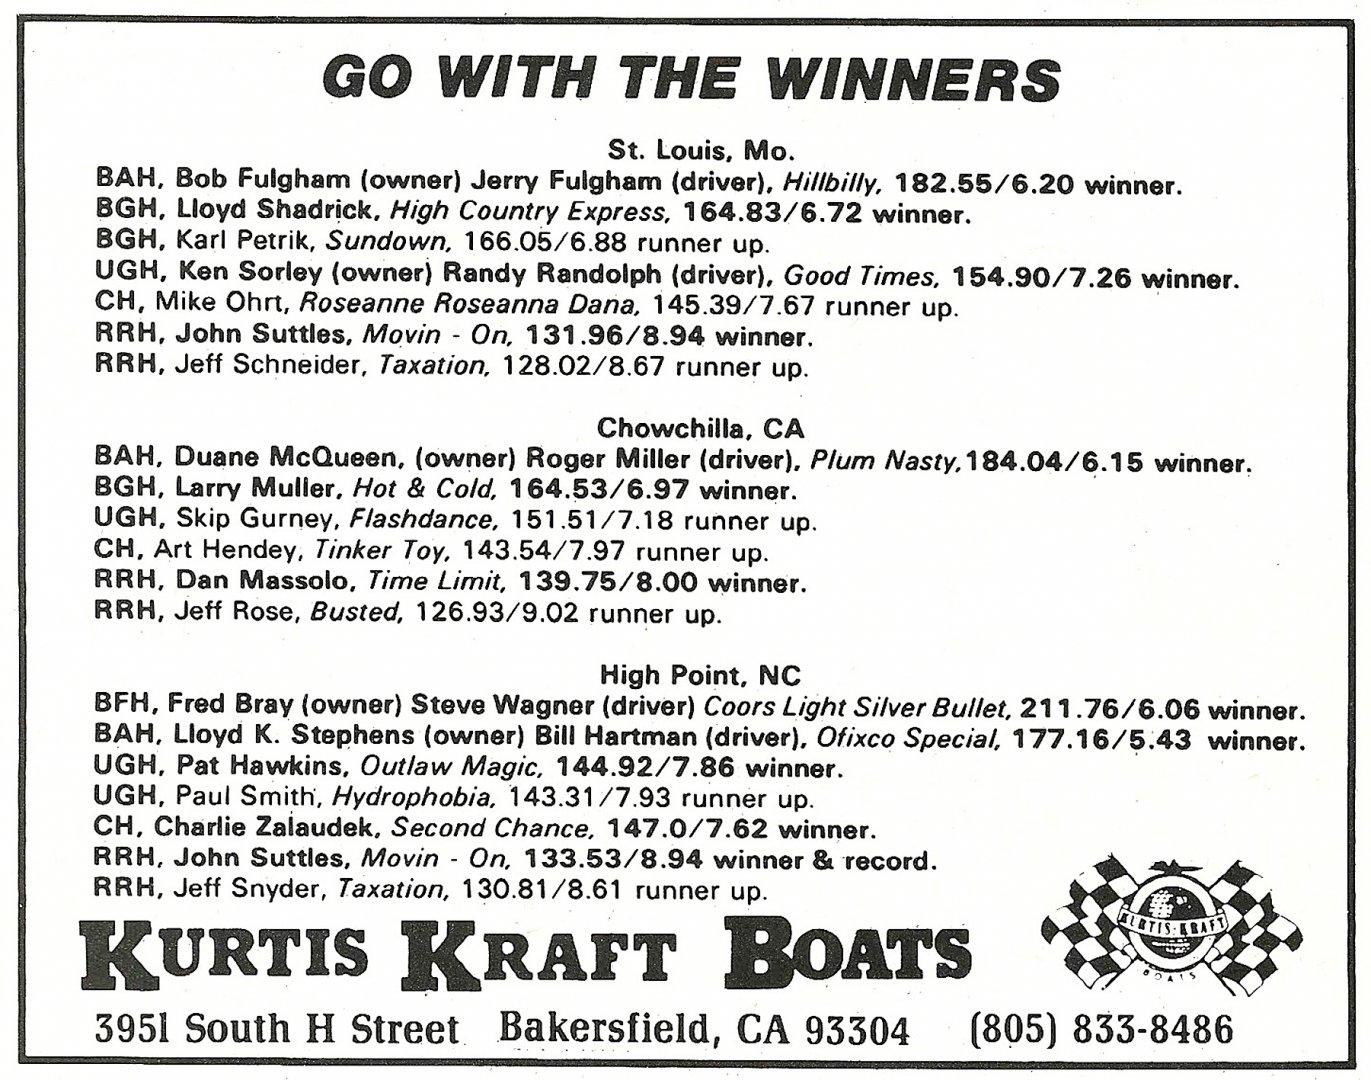 Kurtis Kraft Boats.jpg